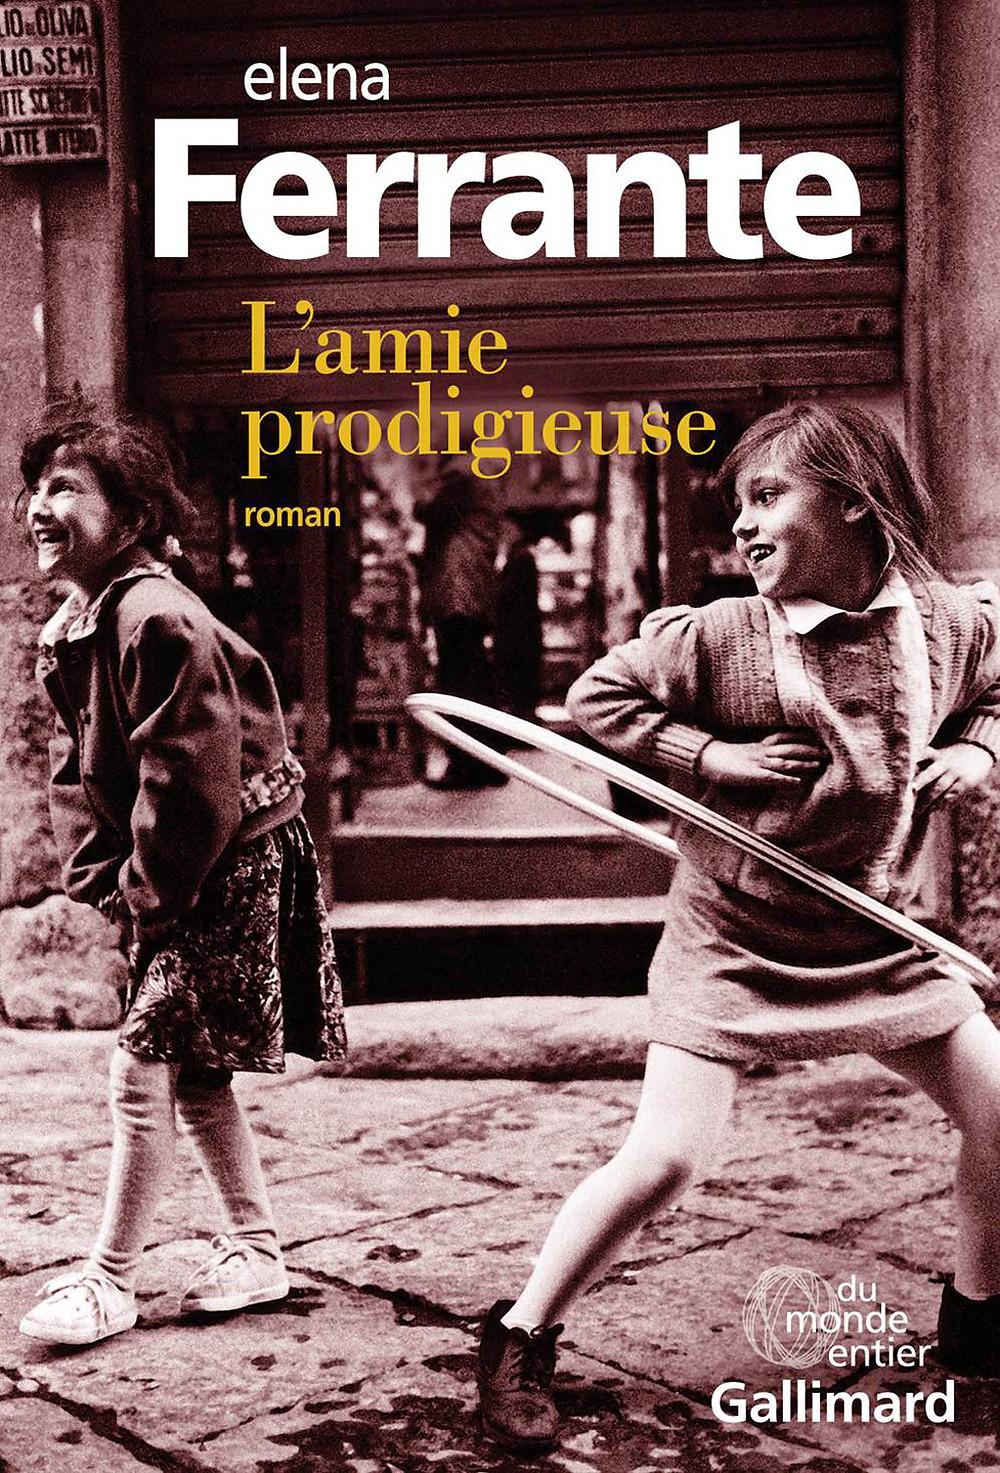 L'amie prodigieuse livre Elena Ferrante